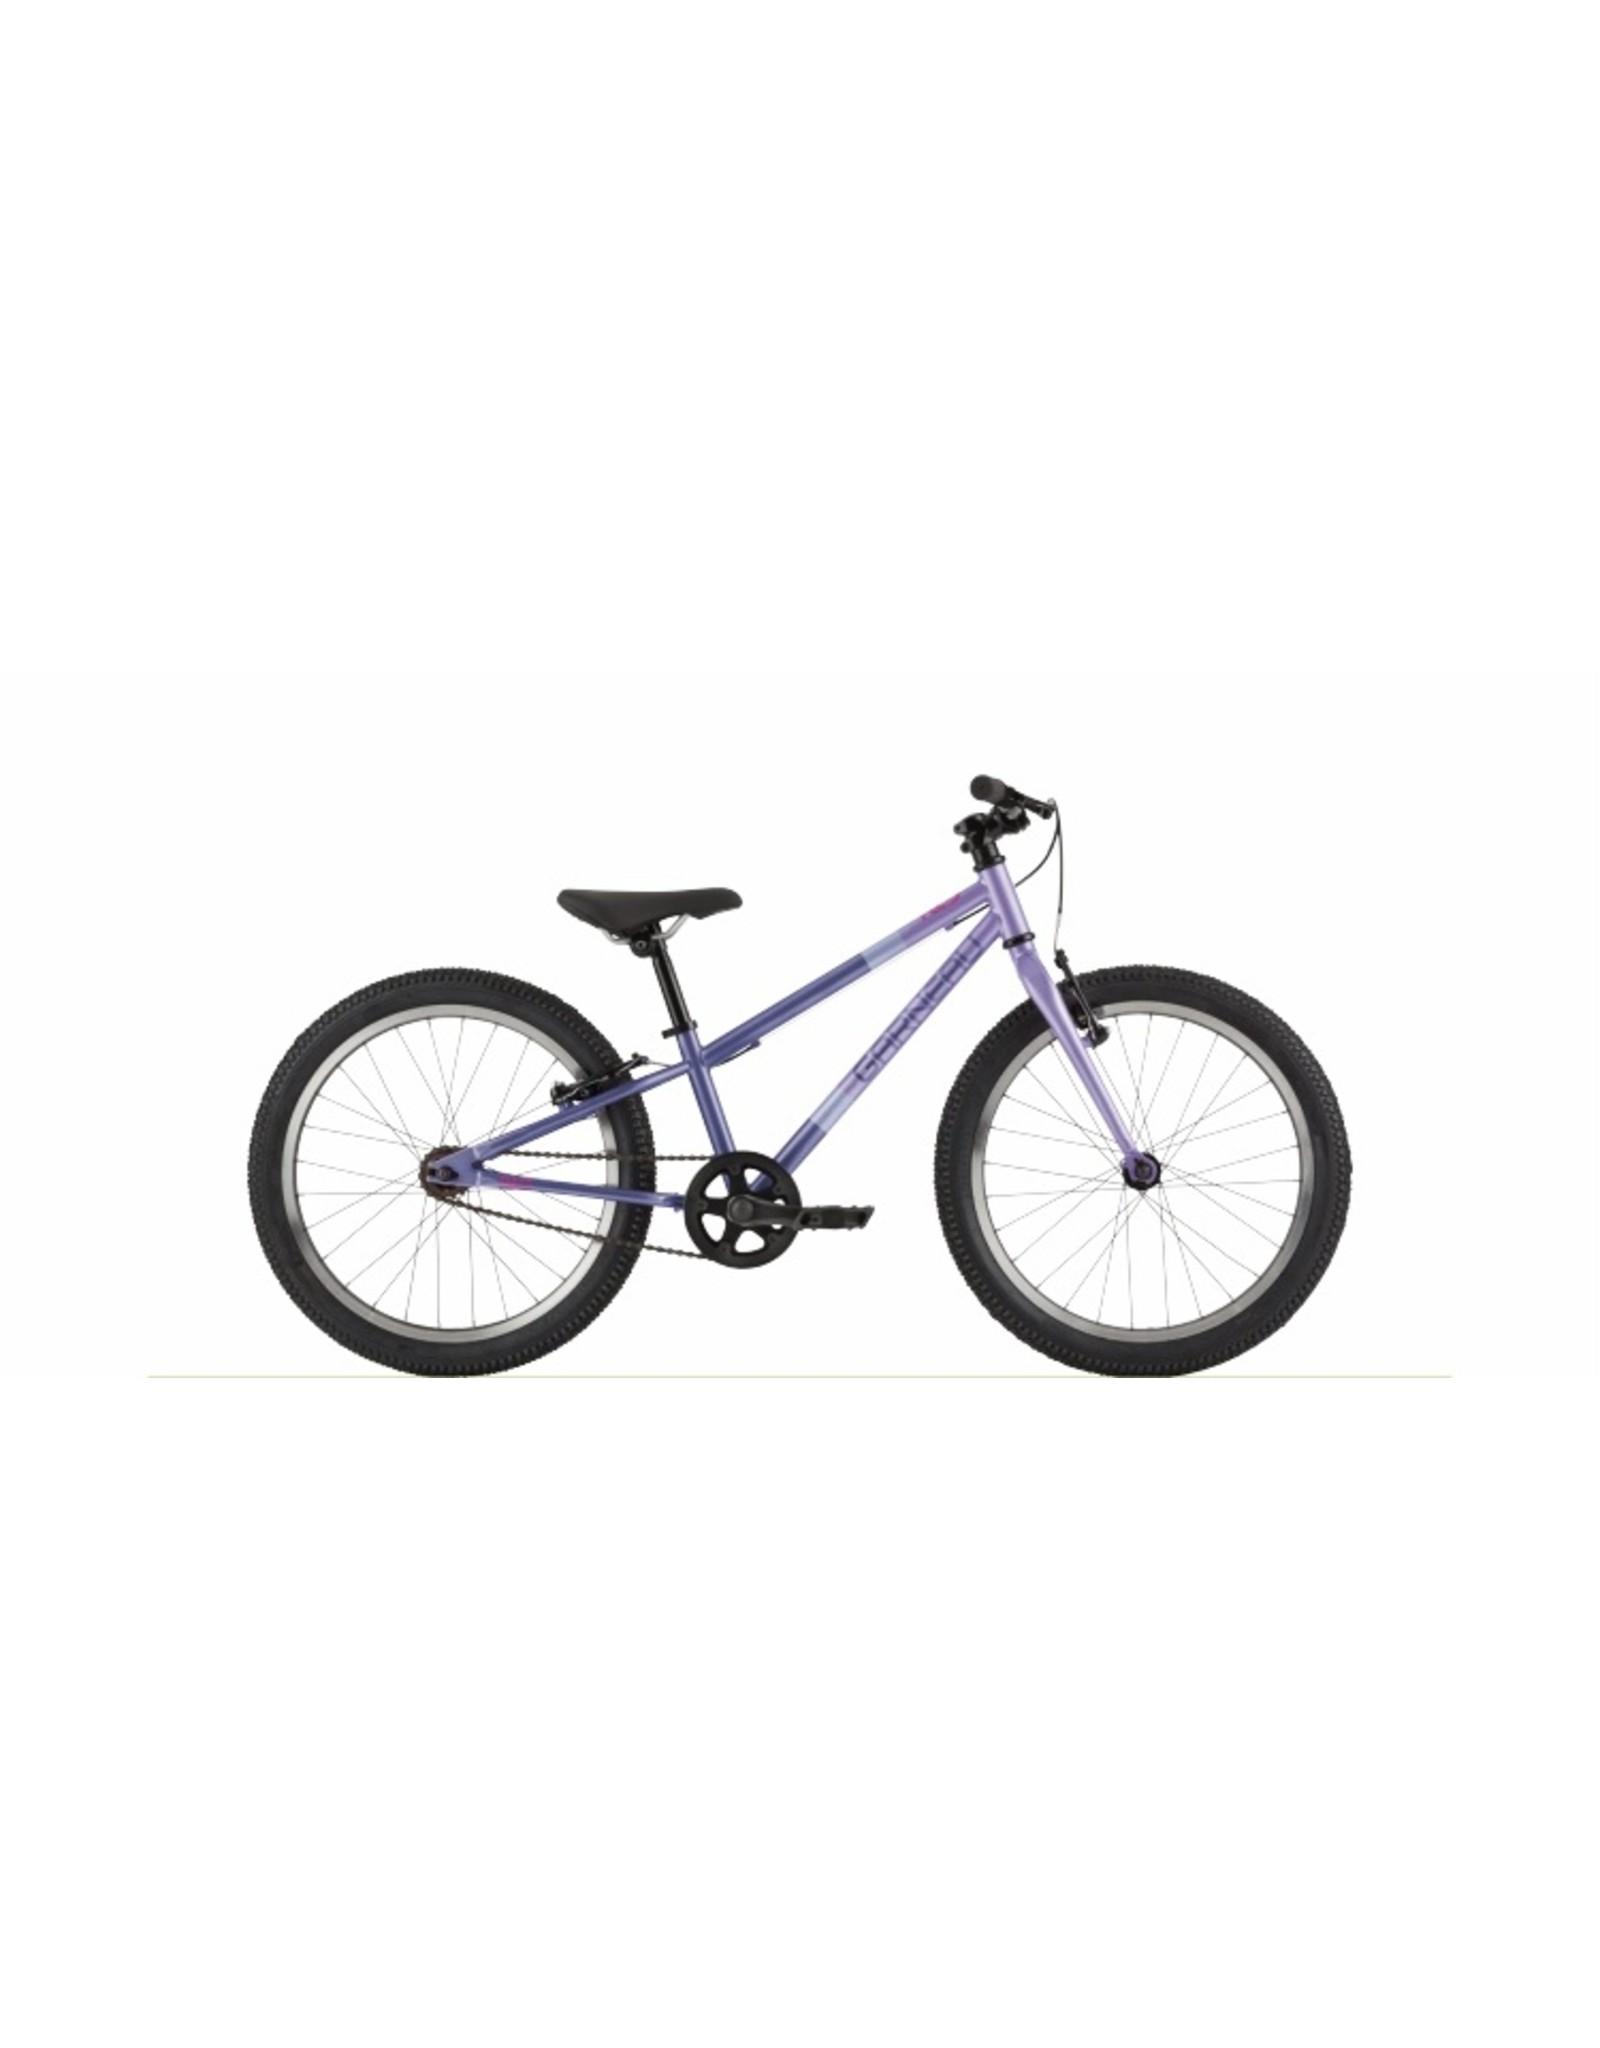 Garneau Garneau Neo 207 Lavender 2021 O/S